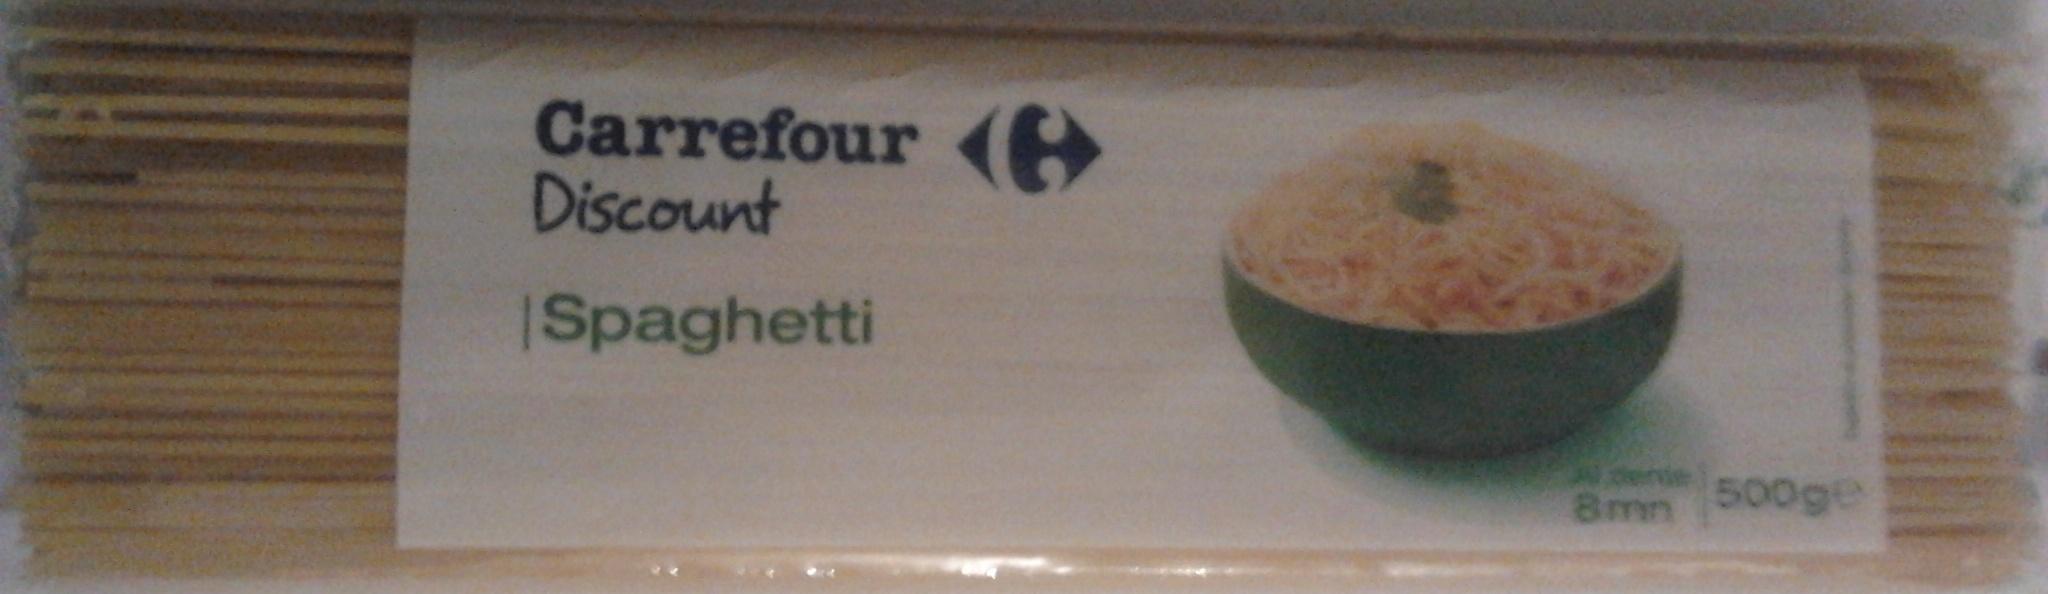 Spaghetti (Al dente 8 mn) - Product - fr